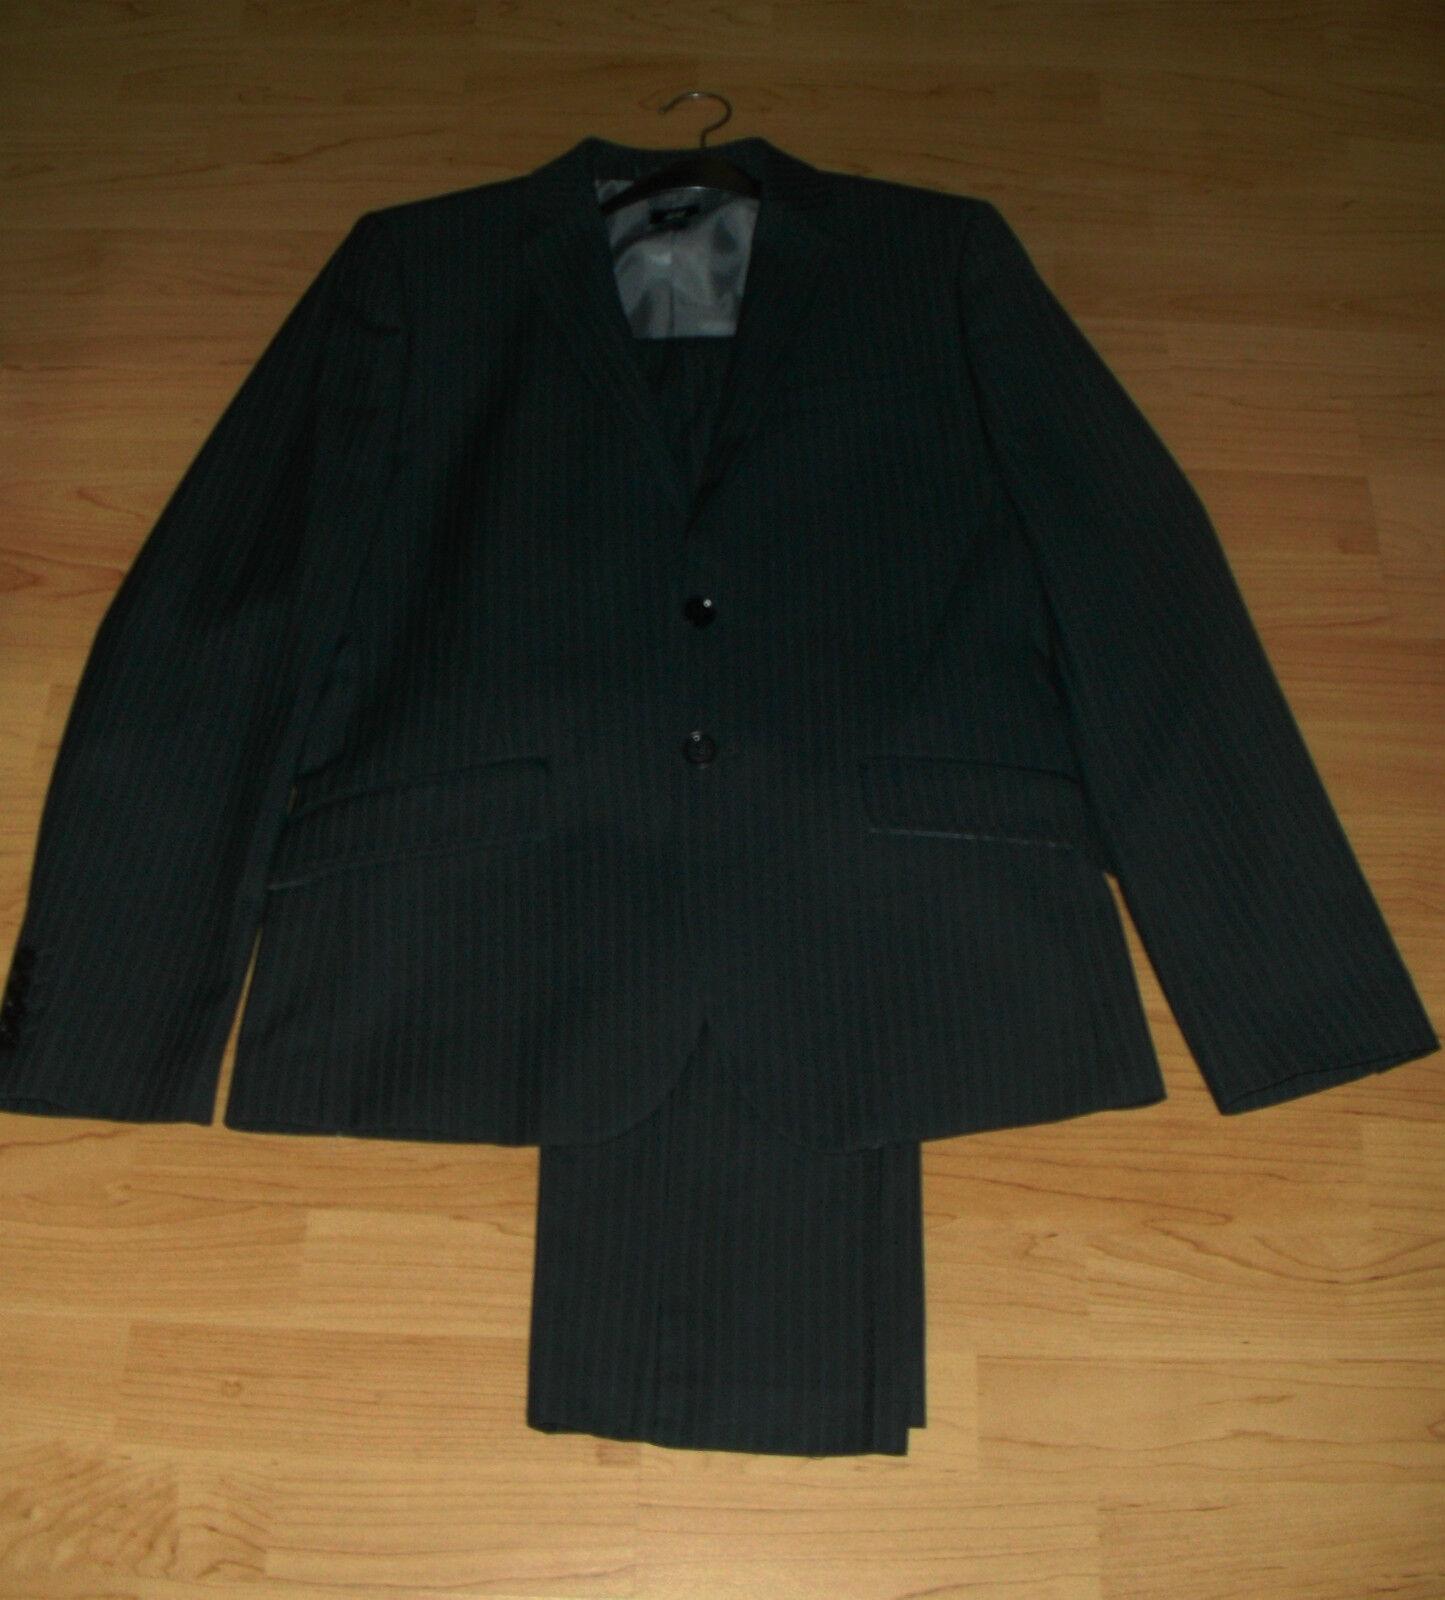 H&M Herrenanzug Anzug 2 Teile Sakko + Hose Gr 48